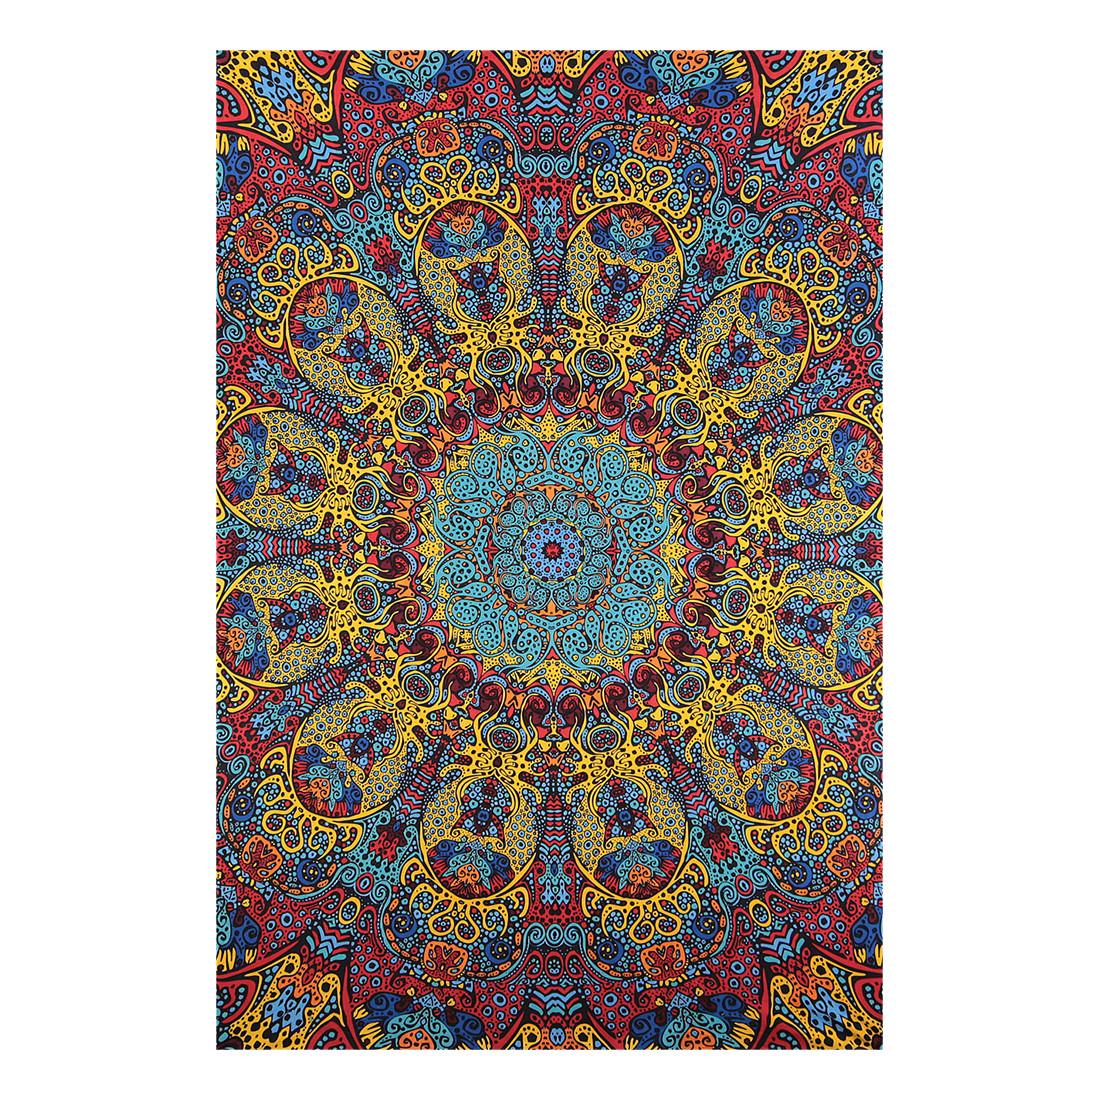 Psychedelic Sunburst 3D Tapestry